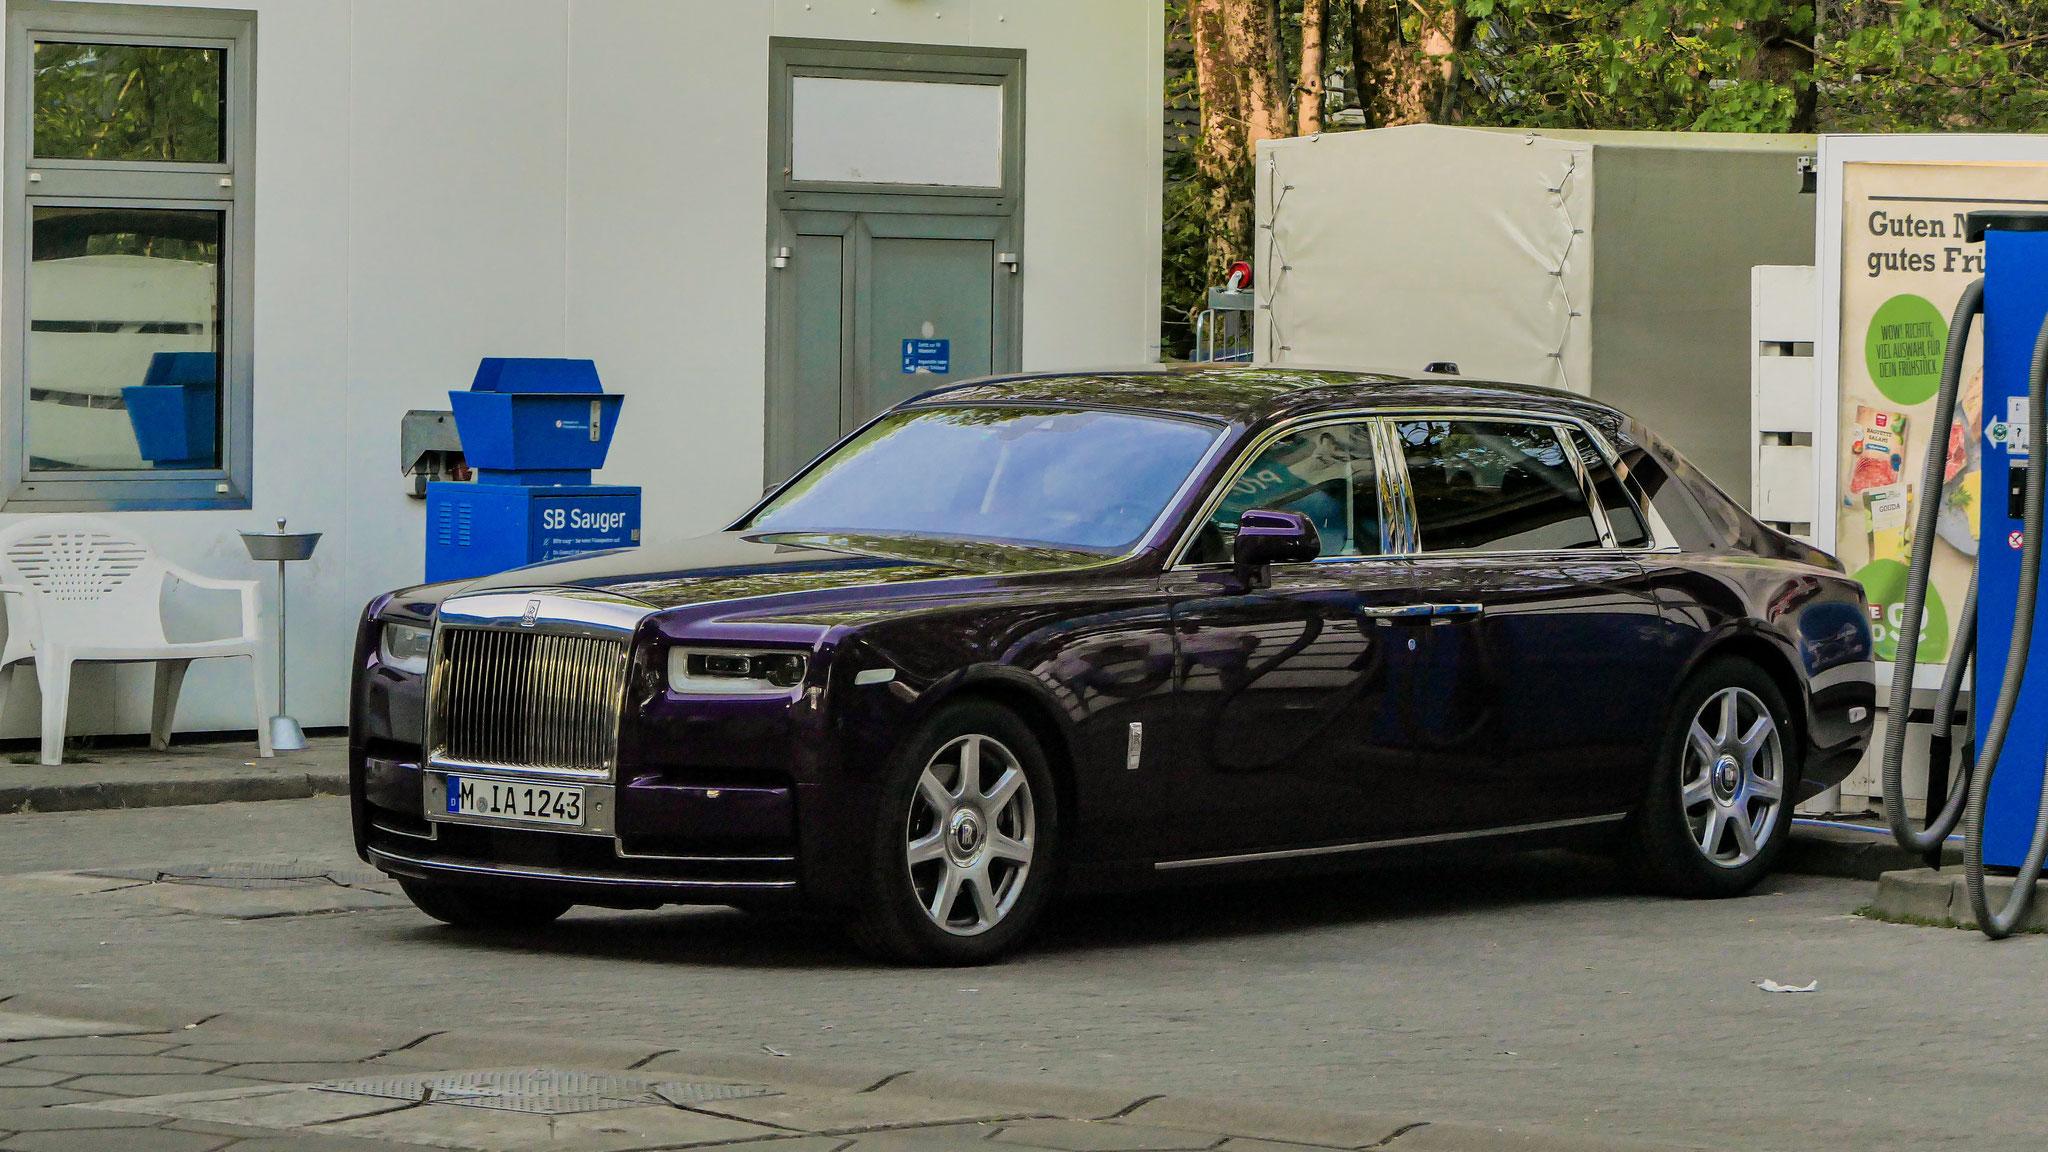 Rolls Royce Phantom - M-IA-1243